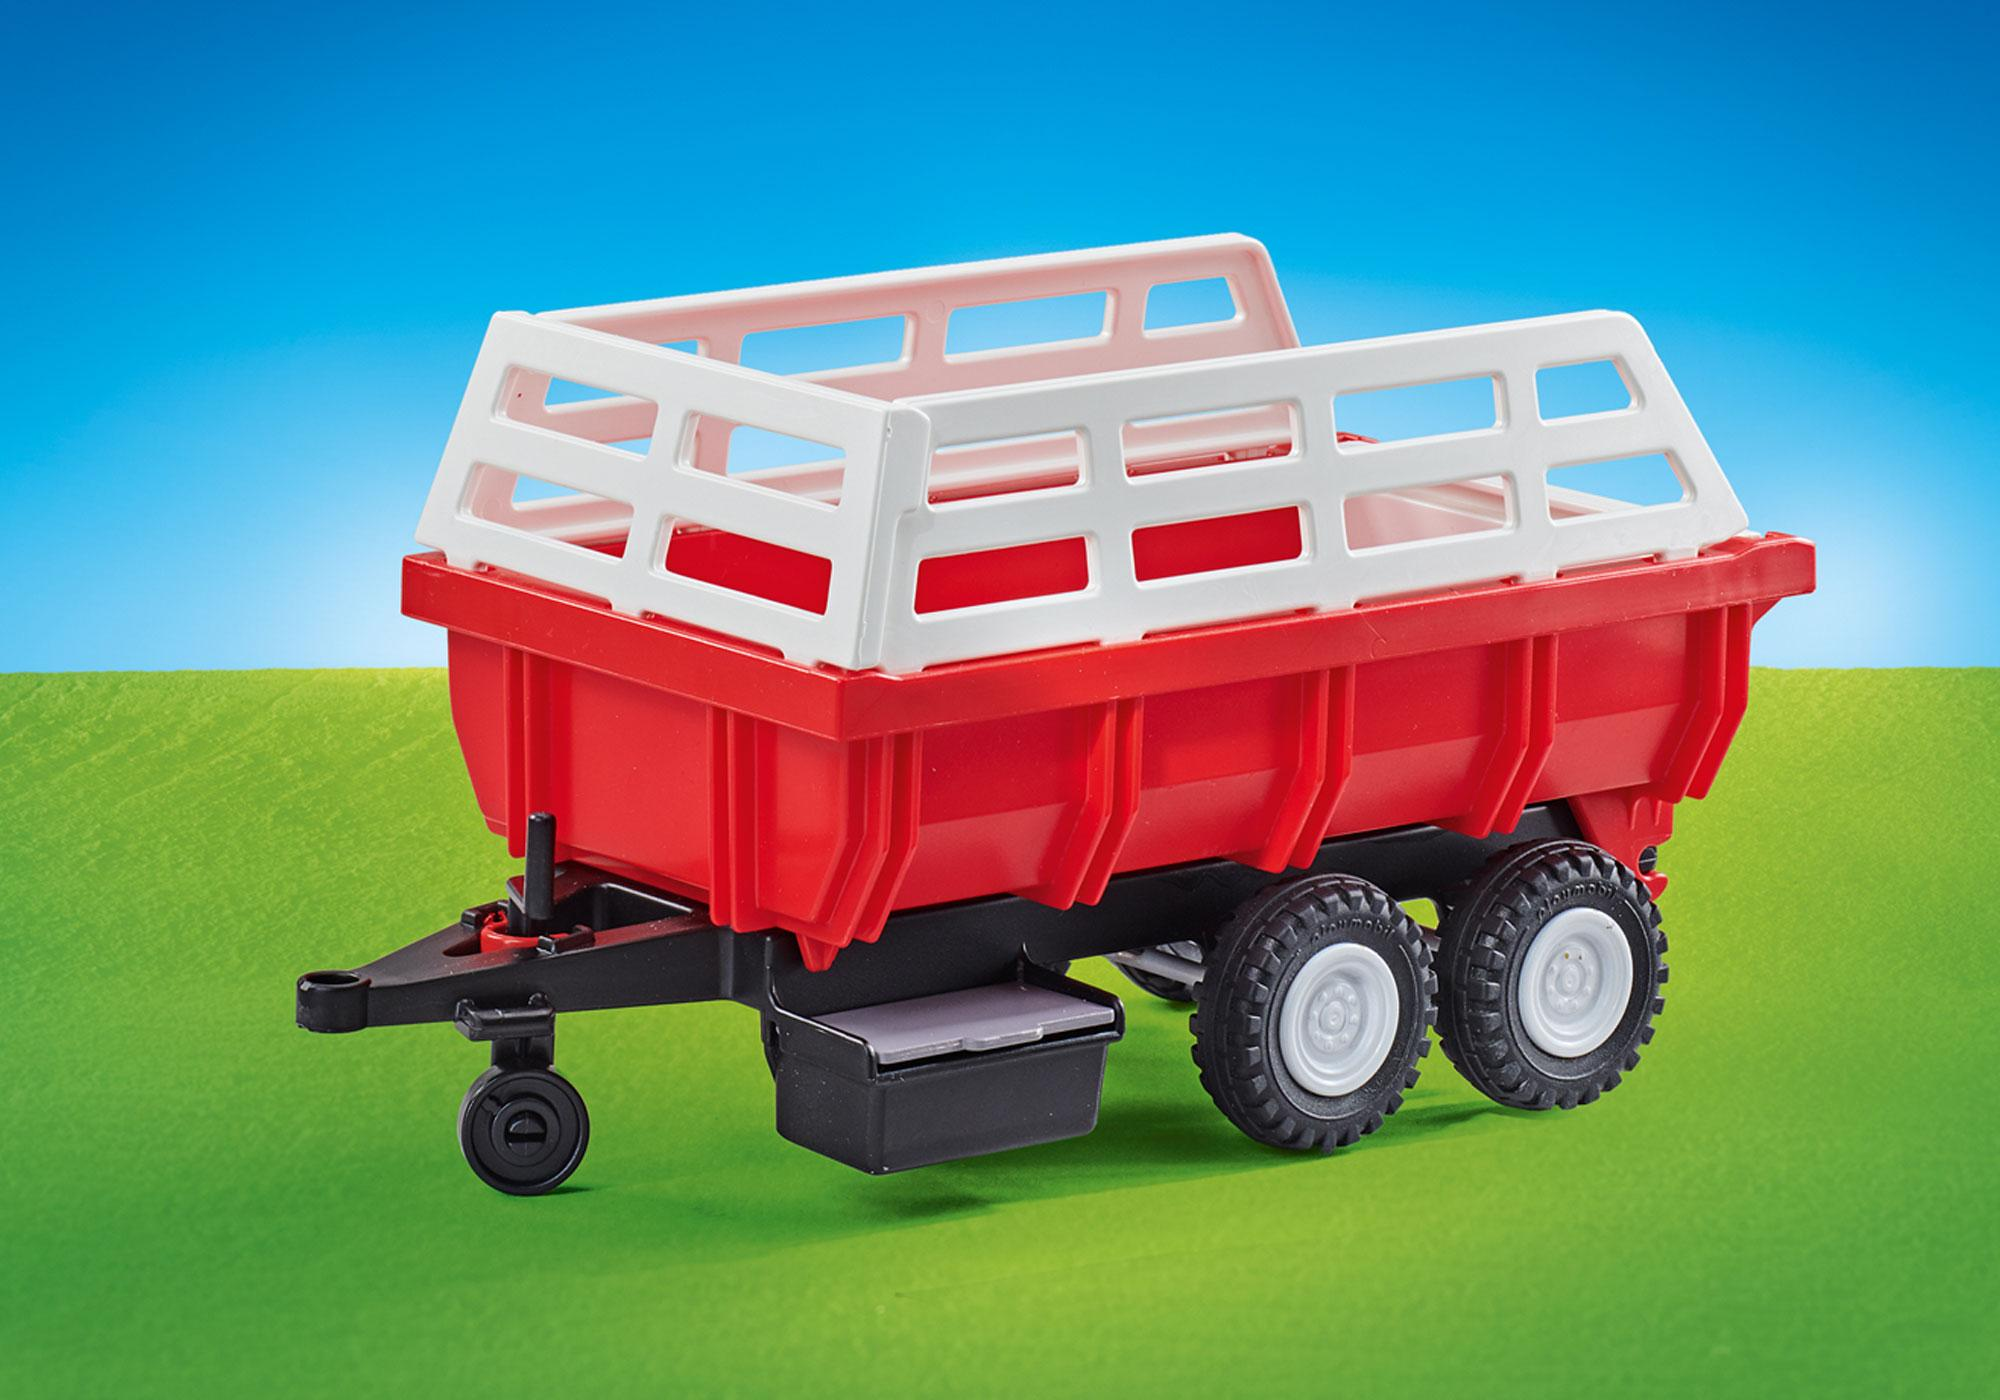 http://media.playmobil.com/i/playmobil/6577_product_detail/Carretto